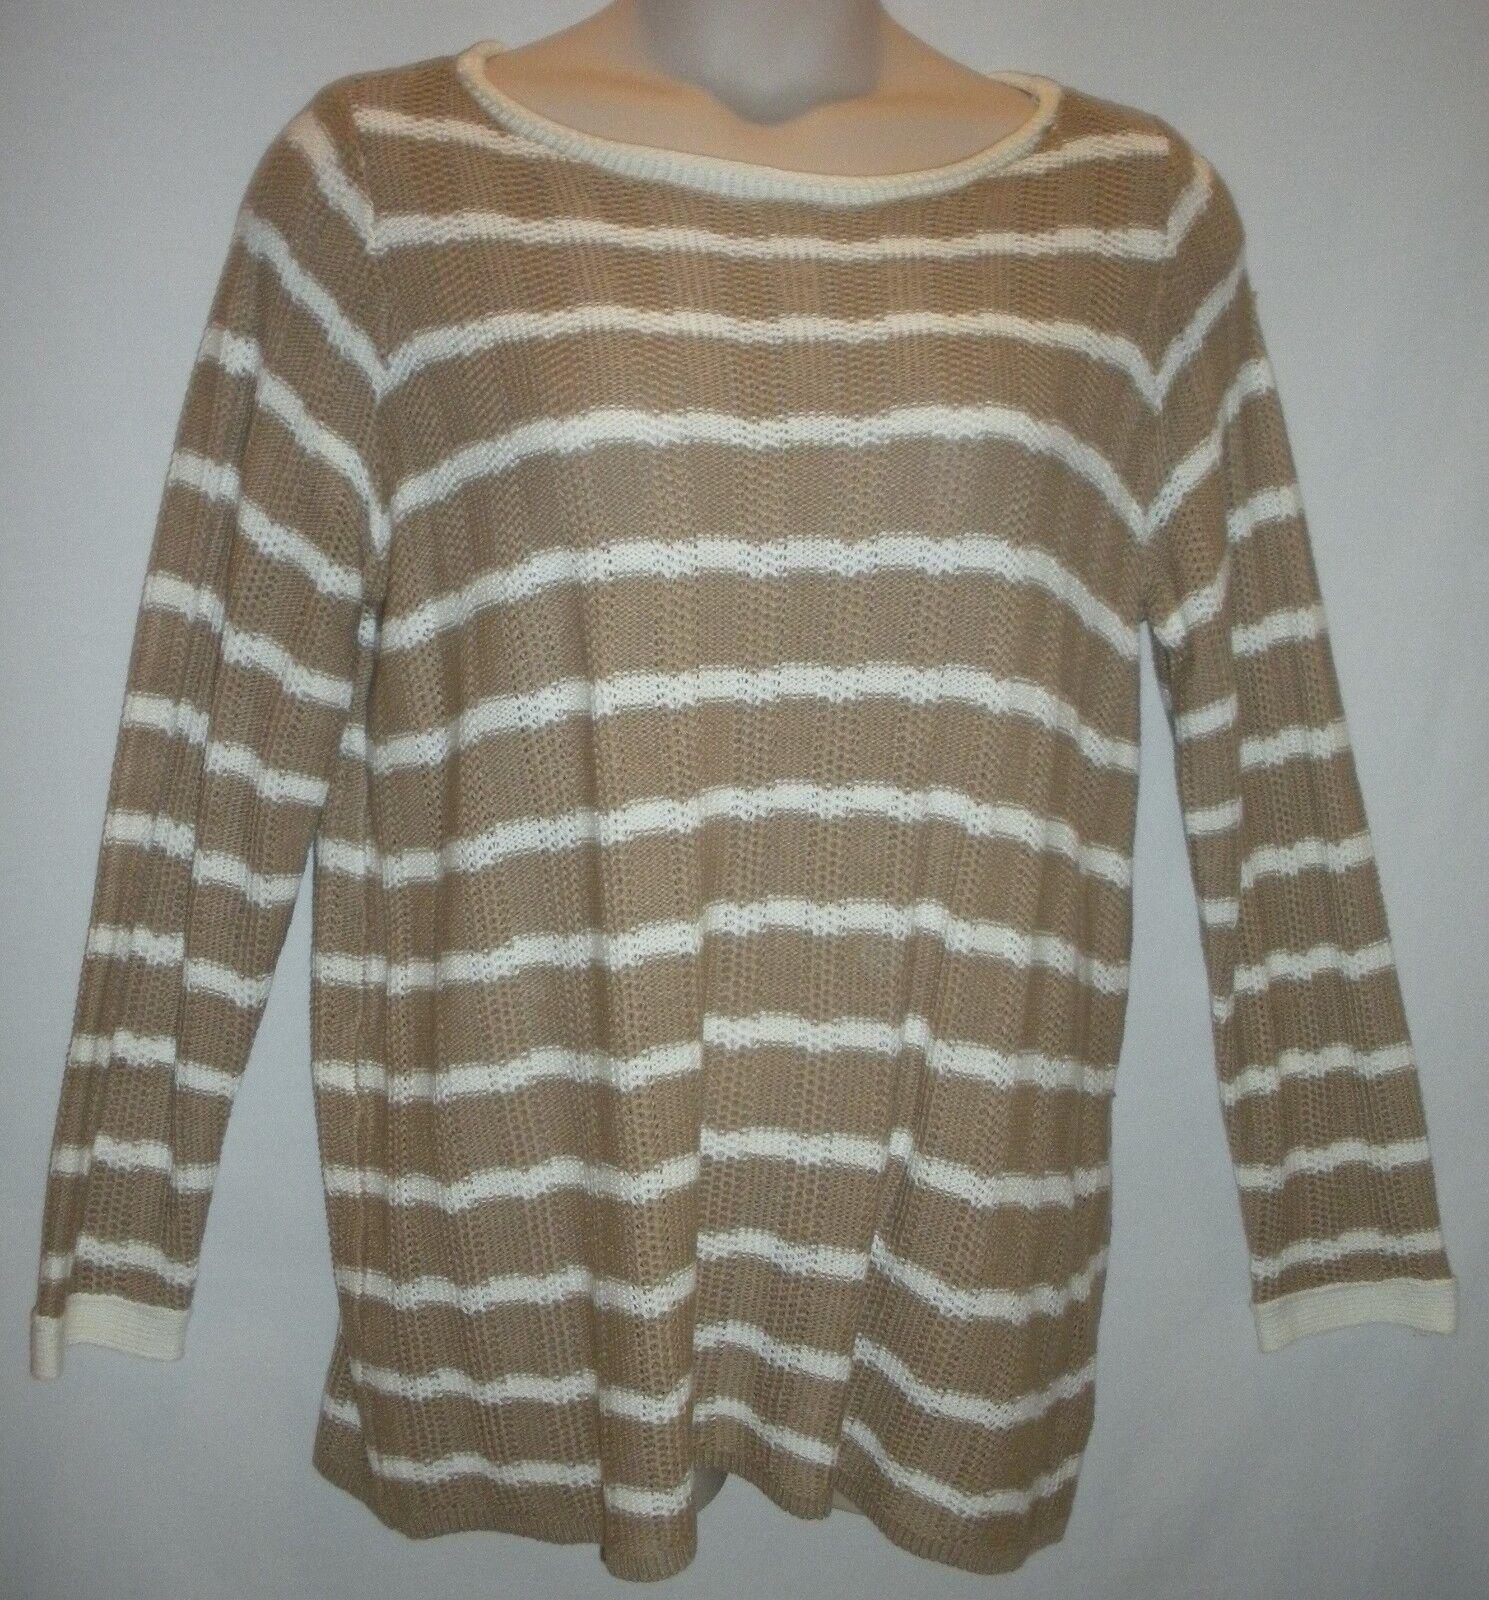 NEW - JONES NEW YORK Long Sleeve Women's Sweater - Plus Size 1X MSRP